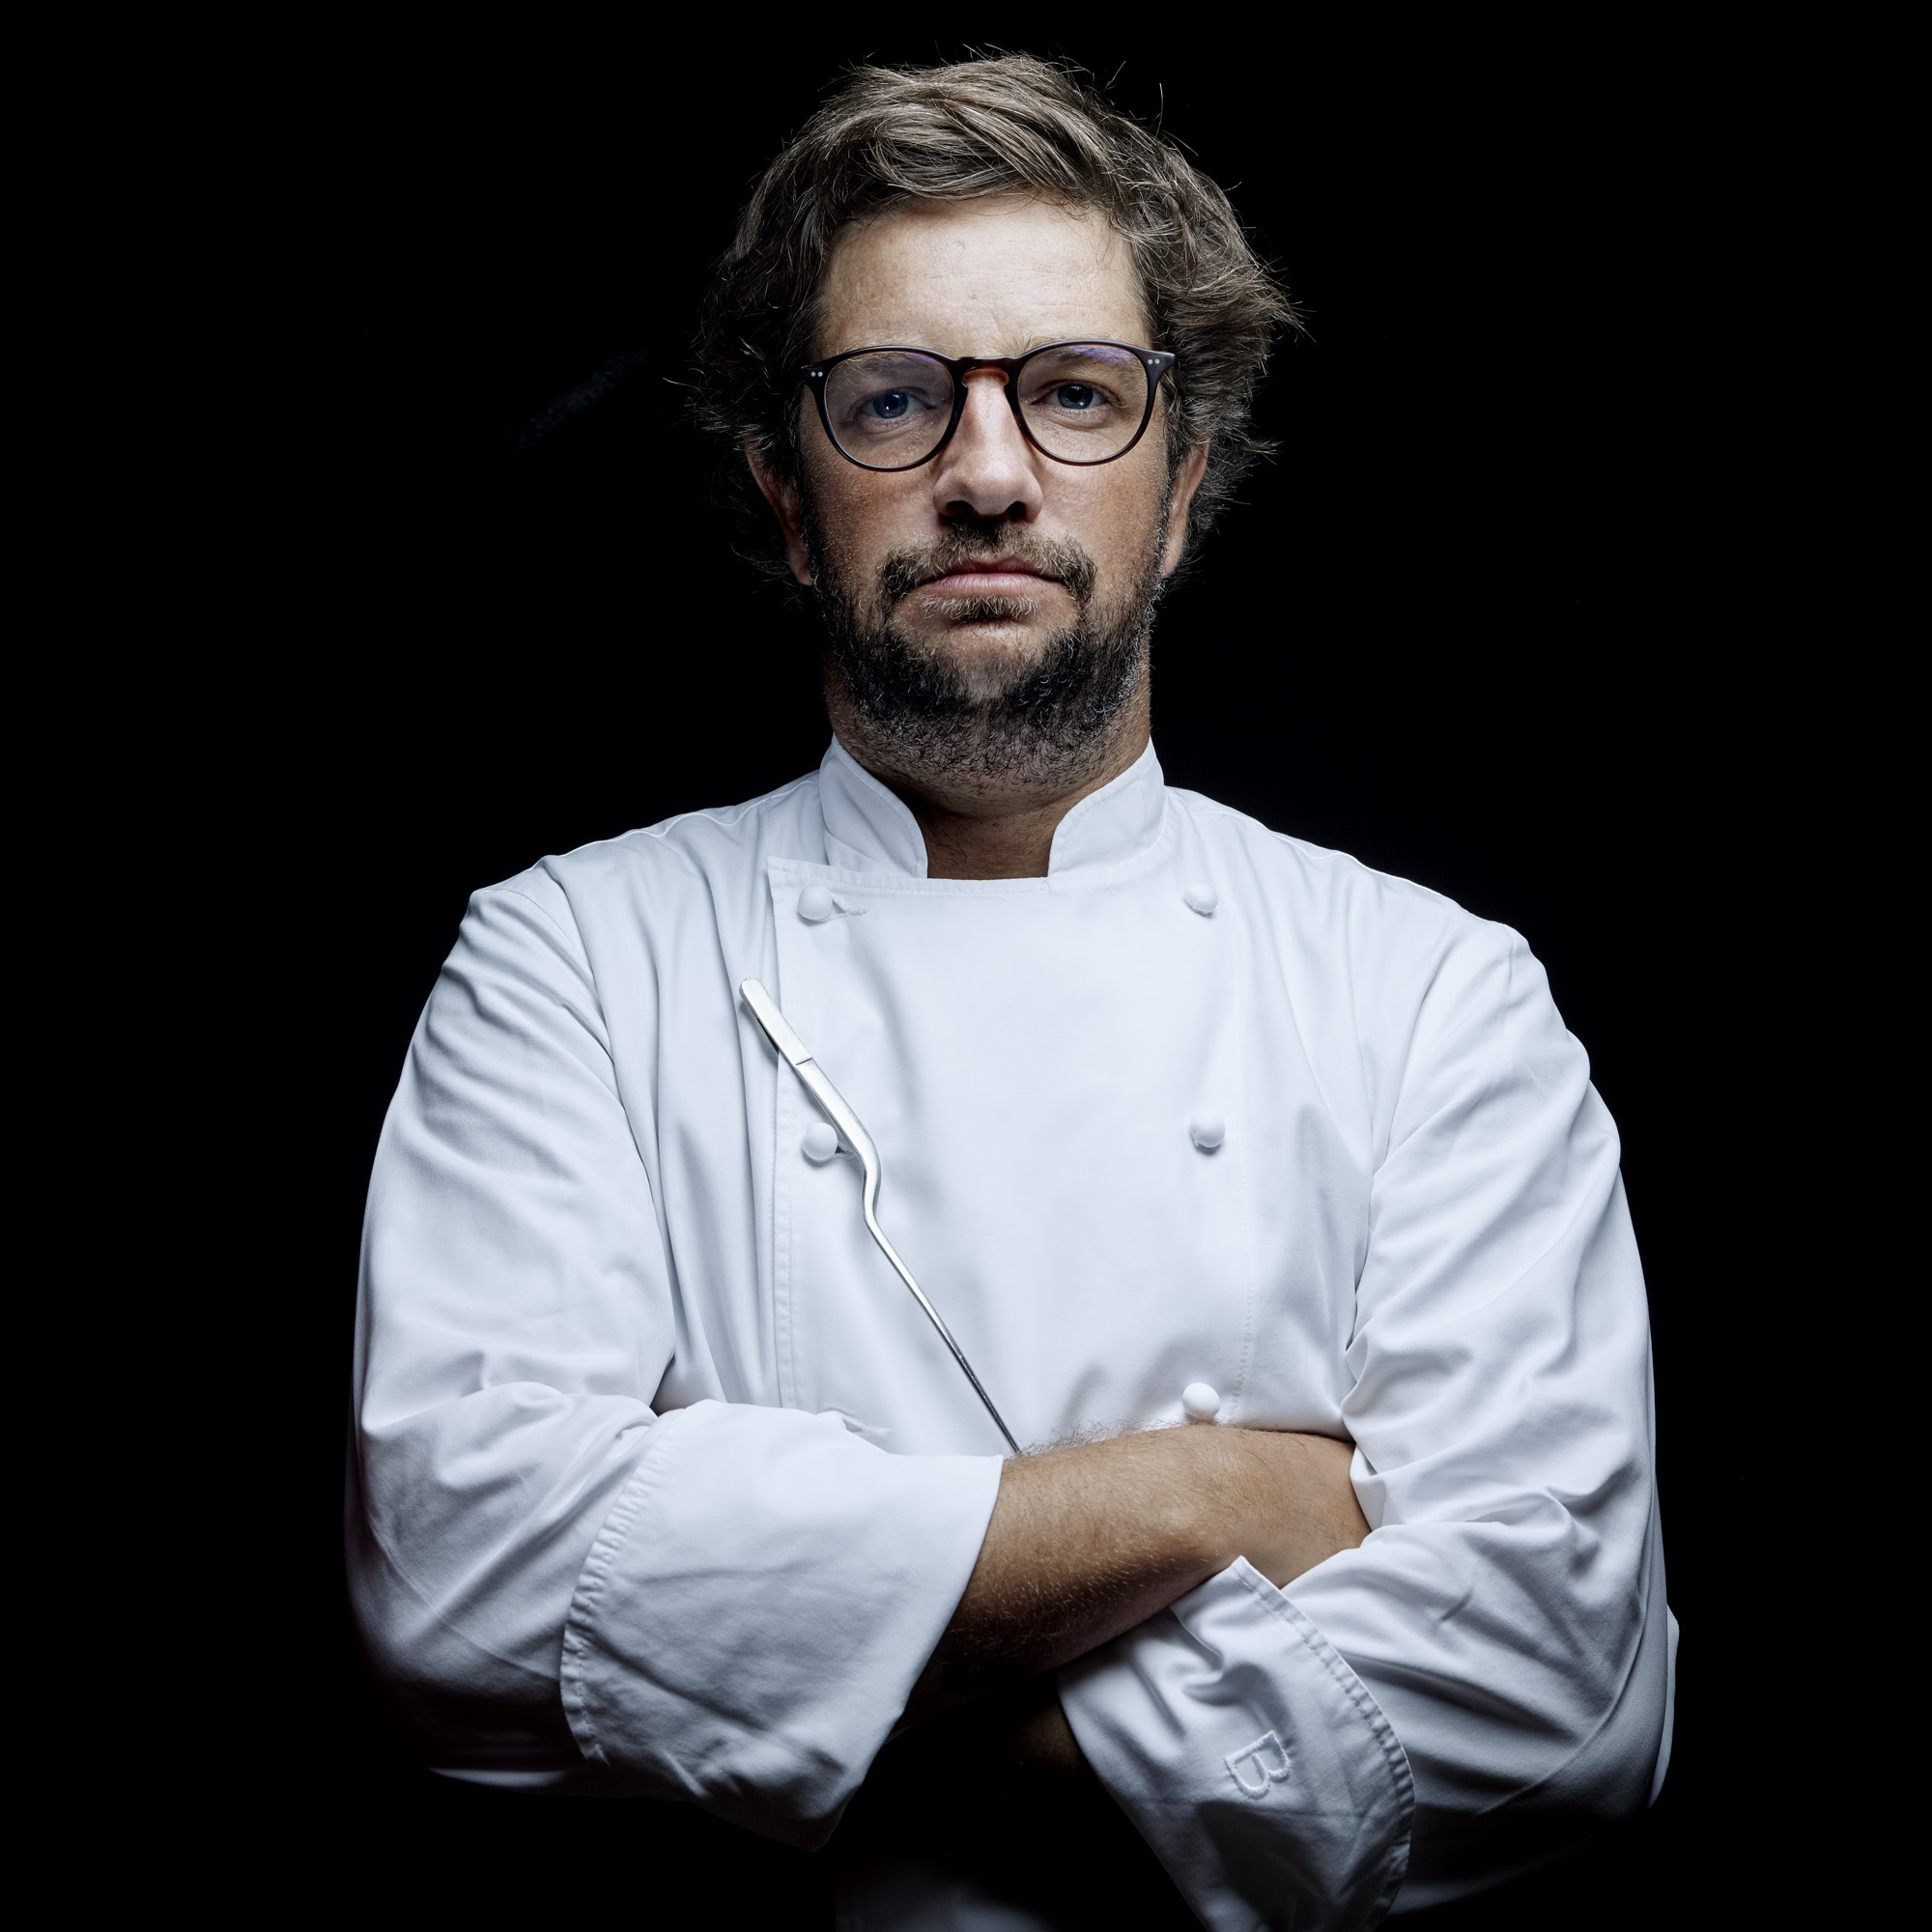 Chef Hervé Witmeur